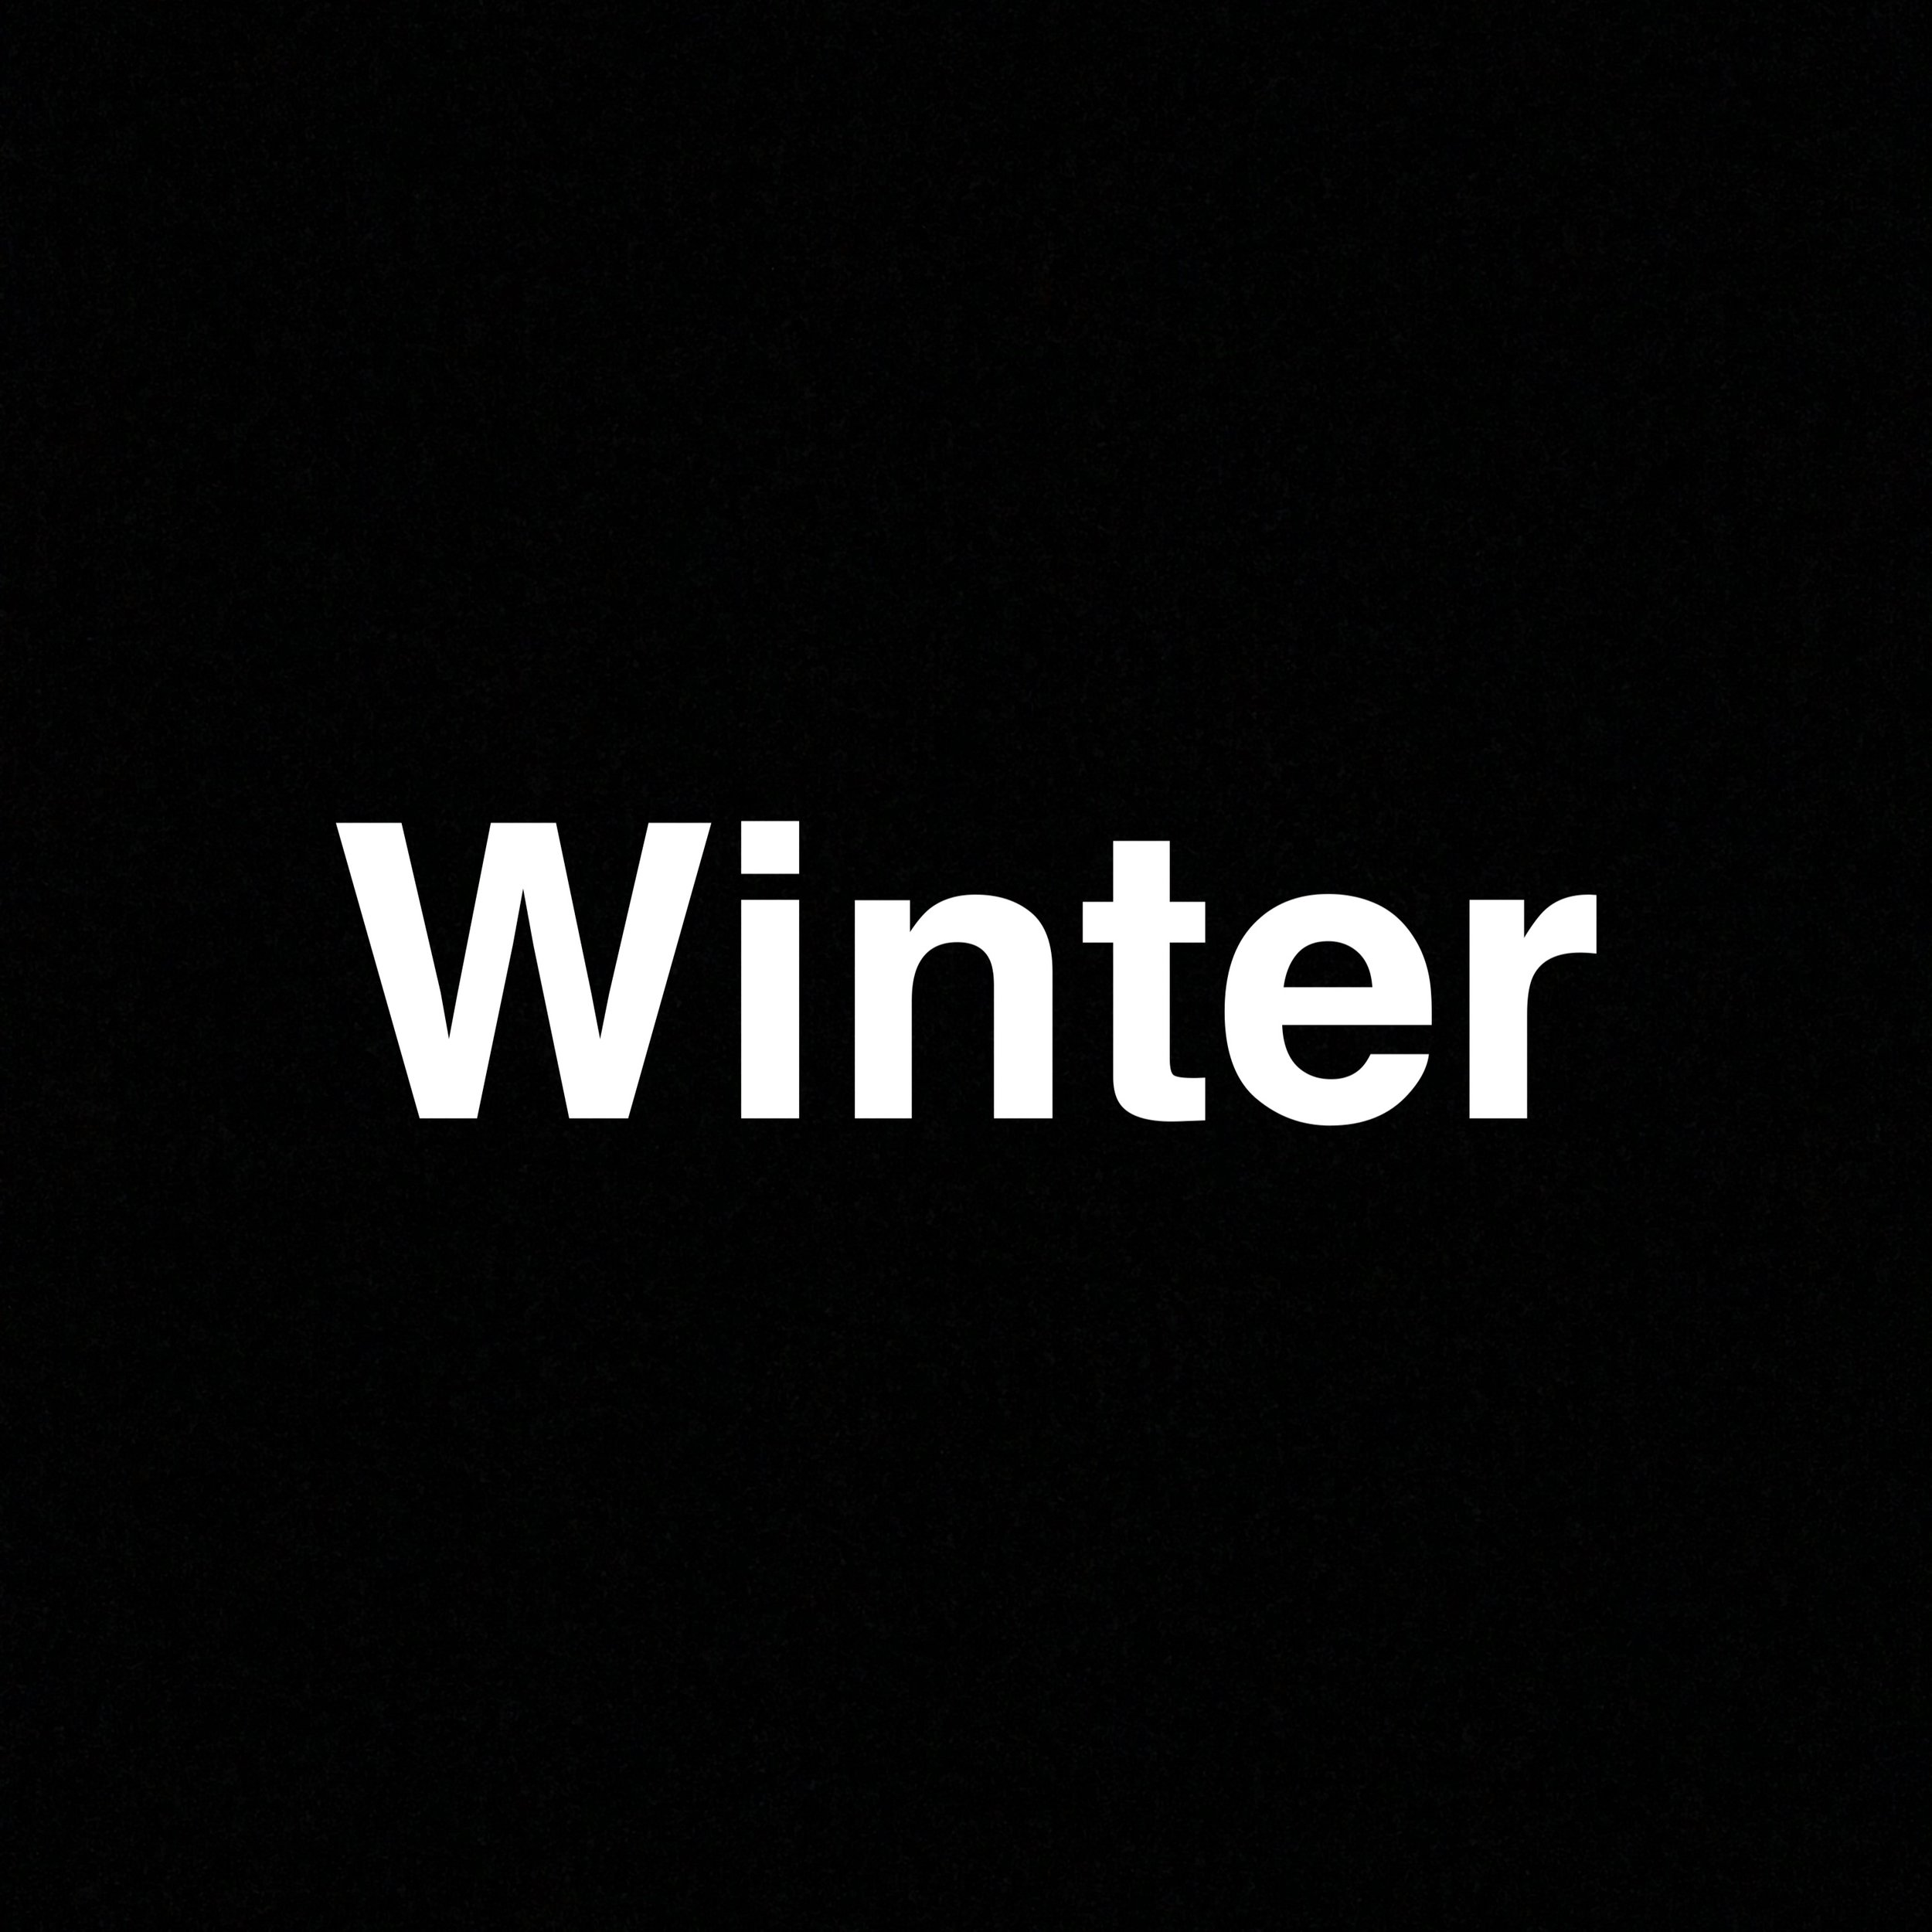 Winter Block.jpg